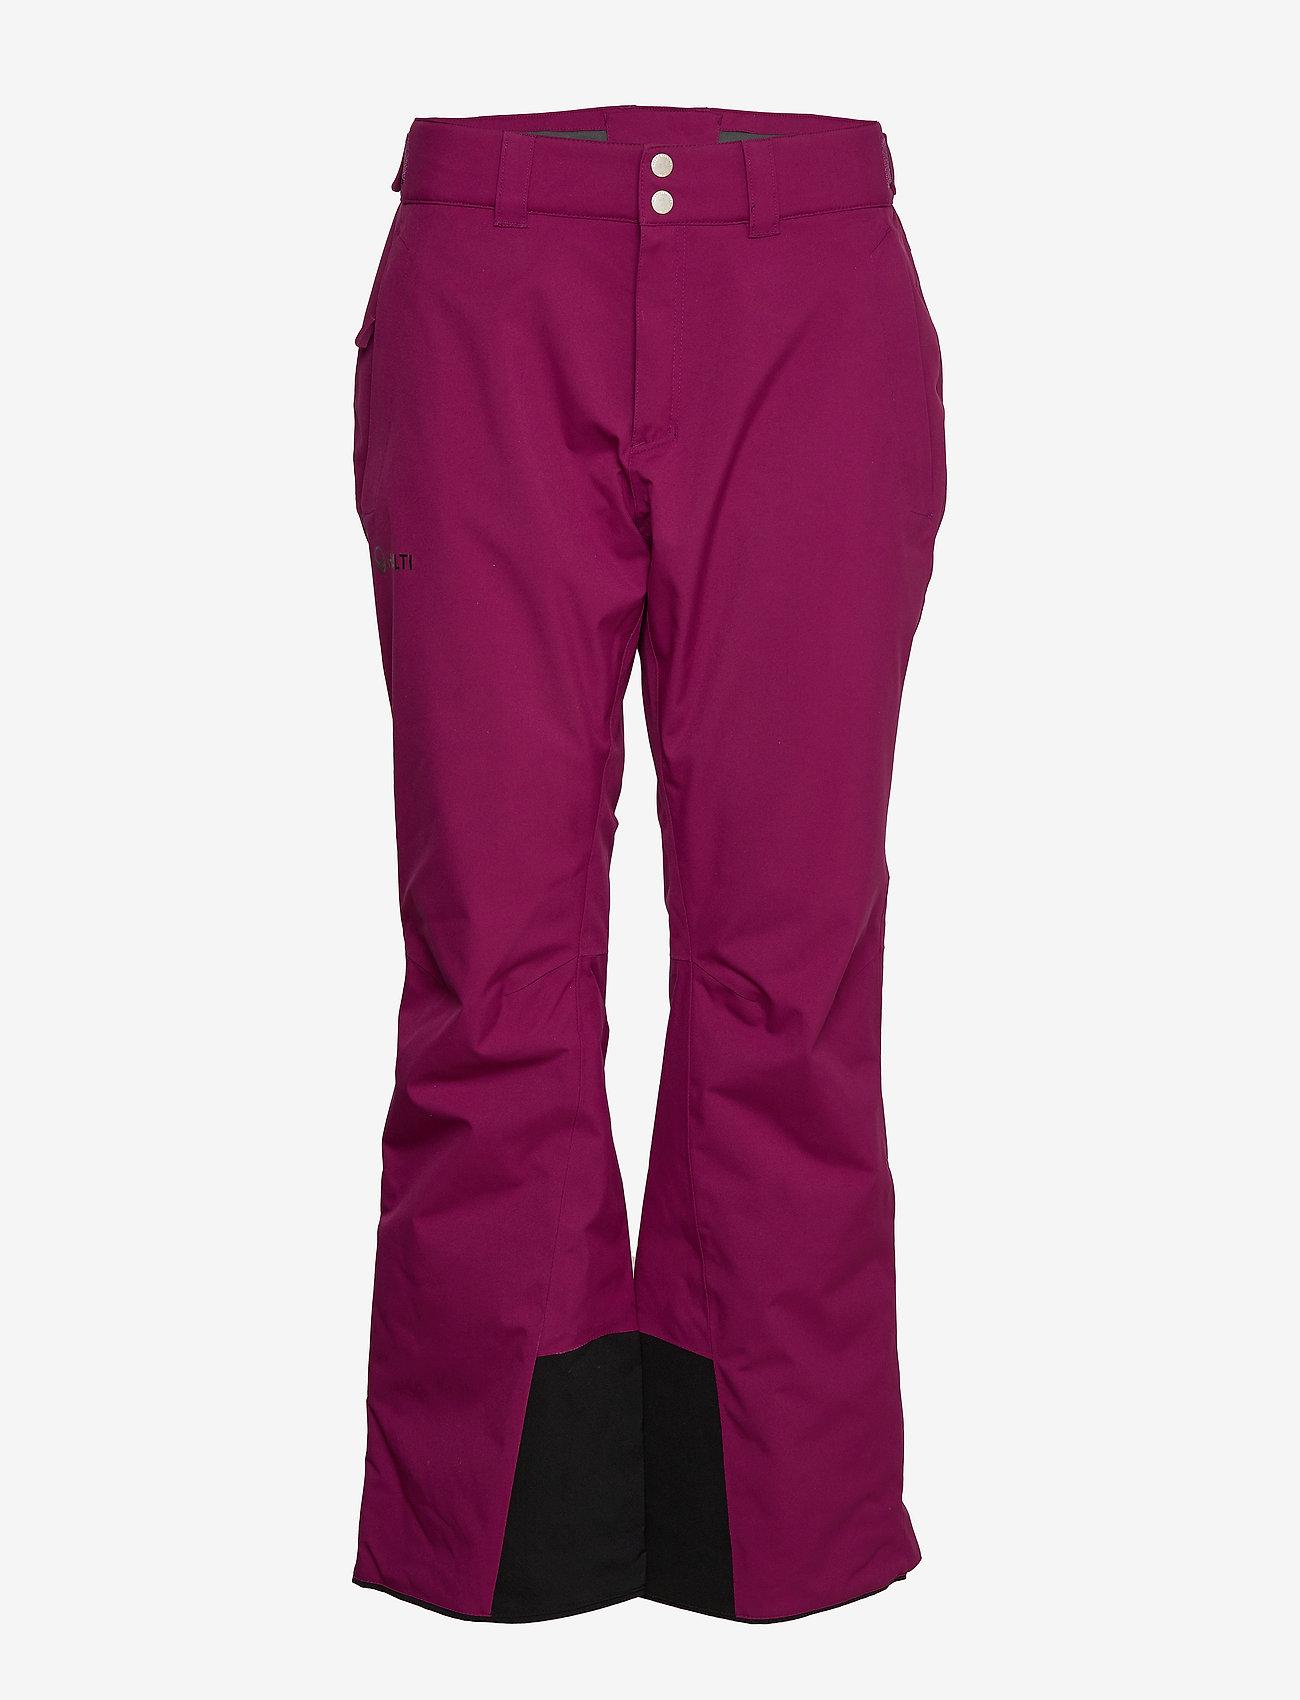 Halti - Puntti II W+ DX ski pants - insulated pants - magenta purple - 0